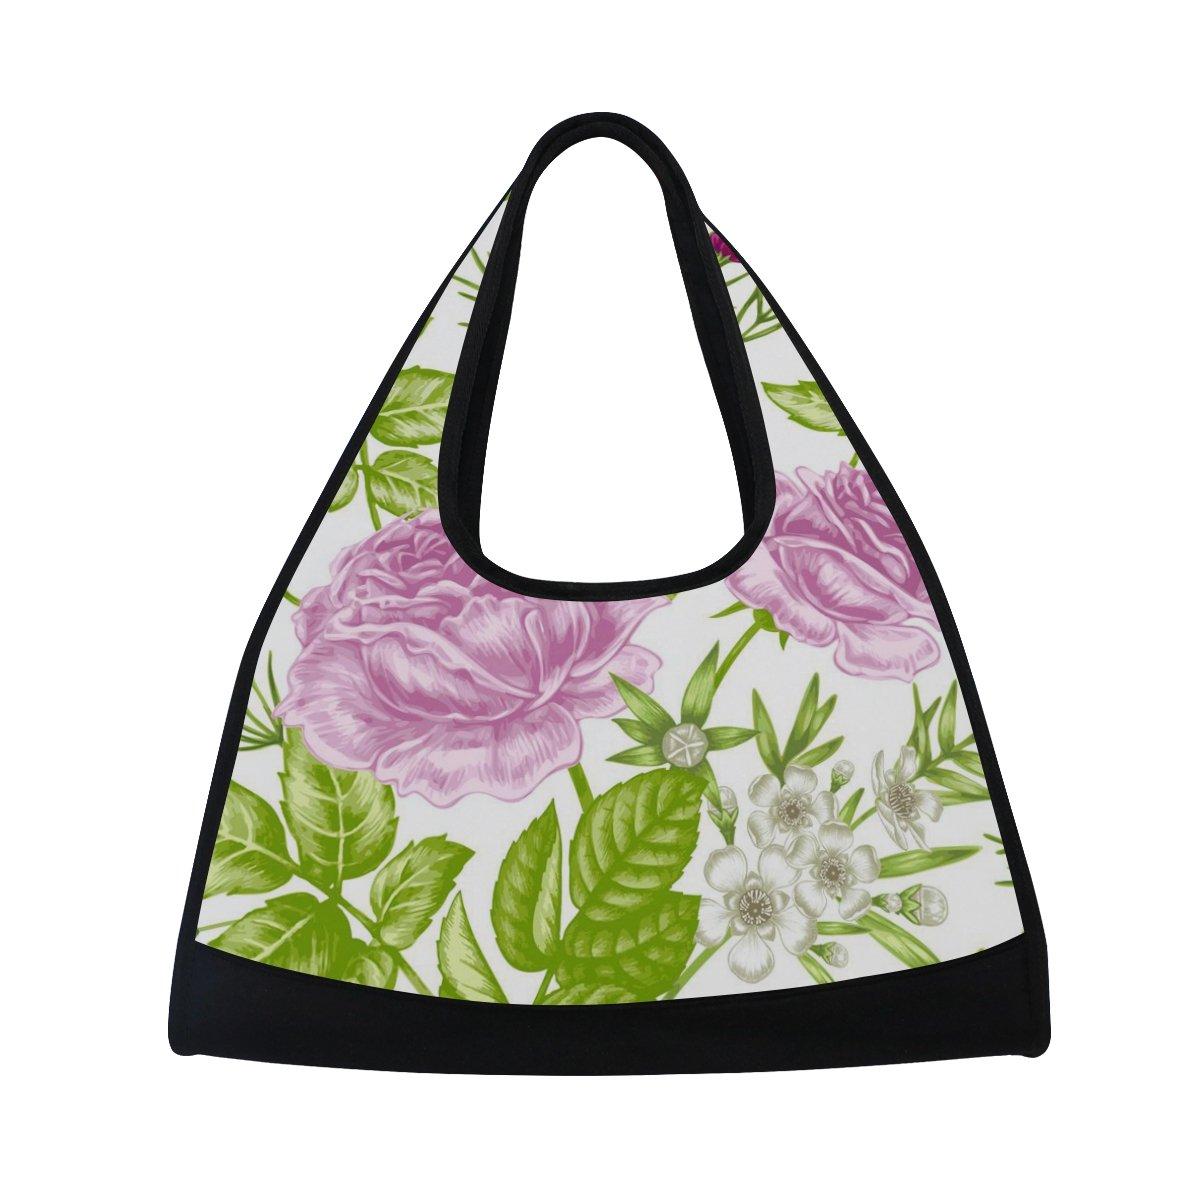 AHOMY Canvas Sports Gym Bag Flower Leaf Duffel Bag Travel Shoulder Bag